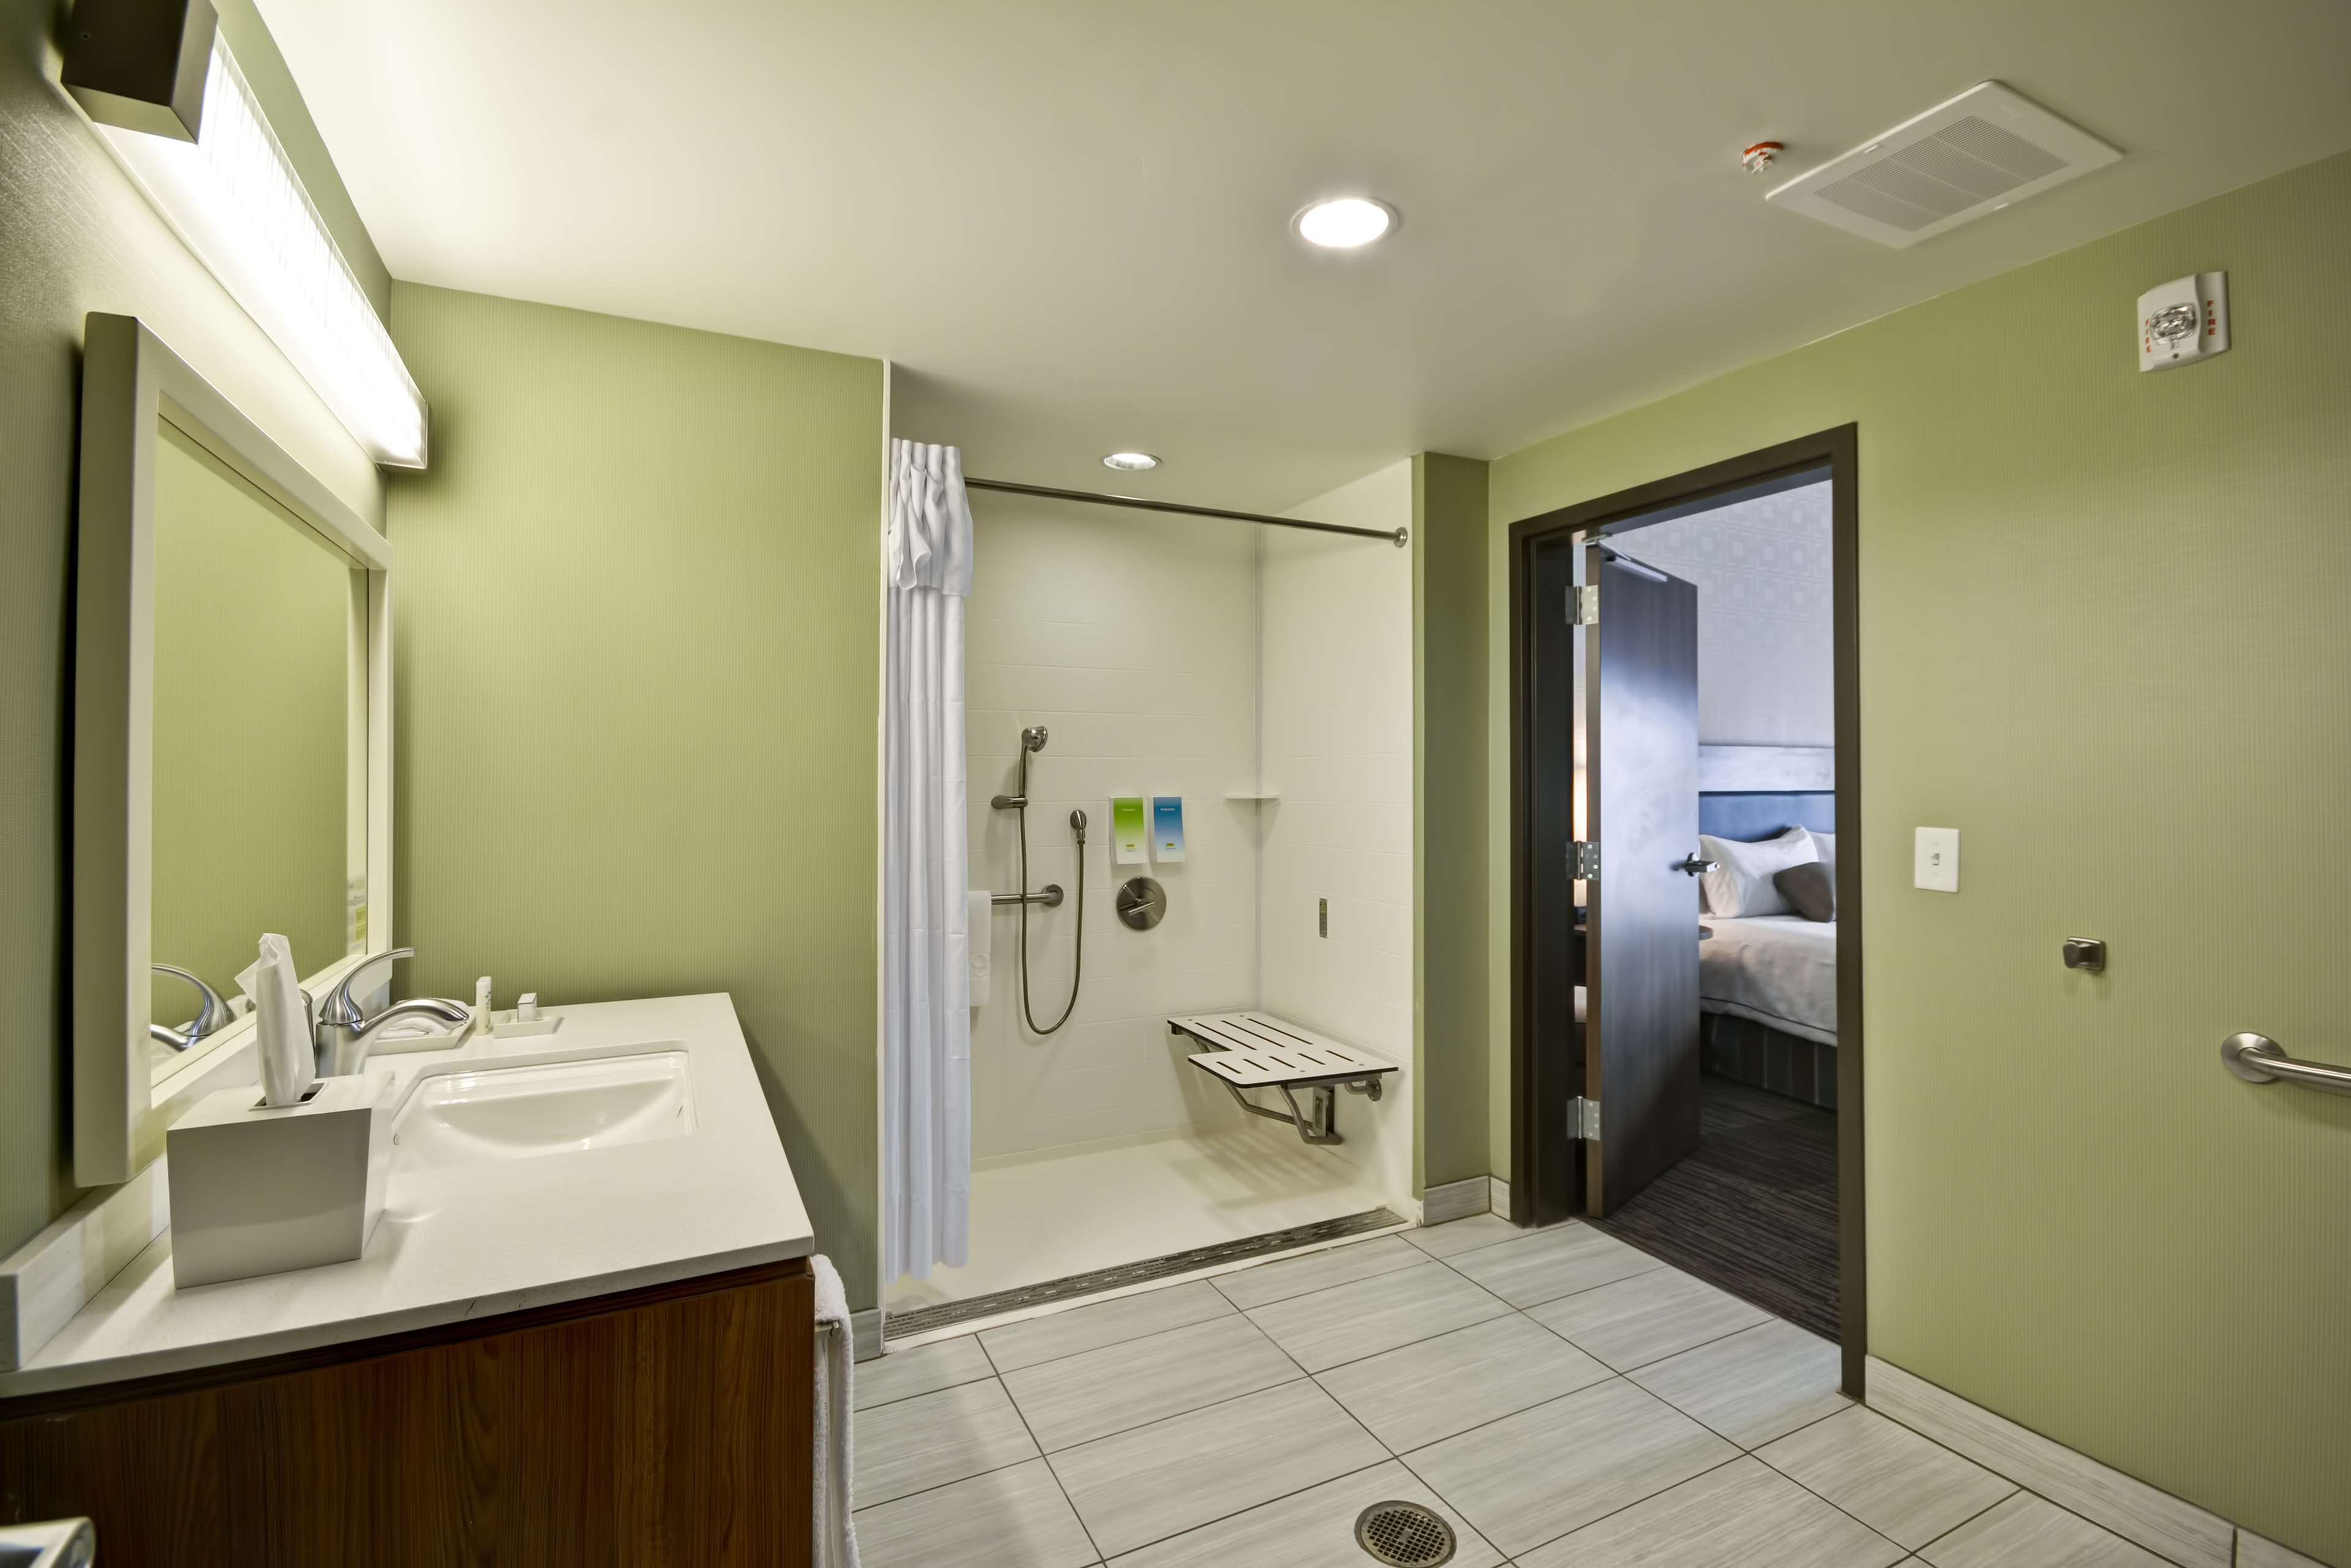 Home2 Suites by Hilton  St. Simons Island image 38